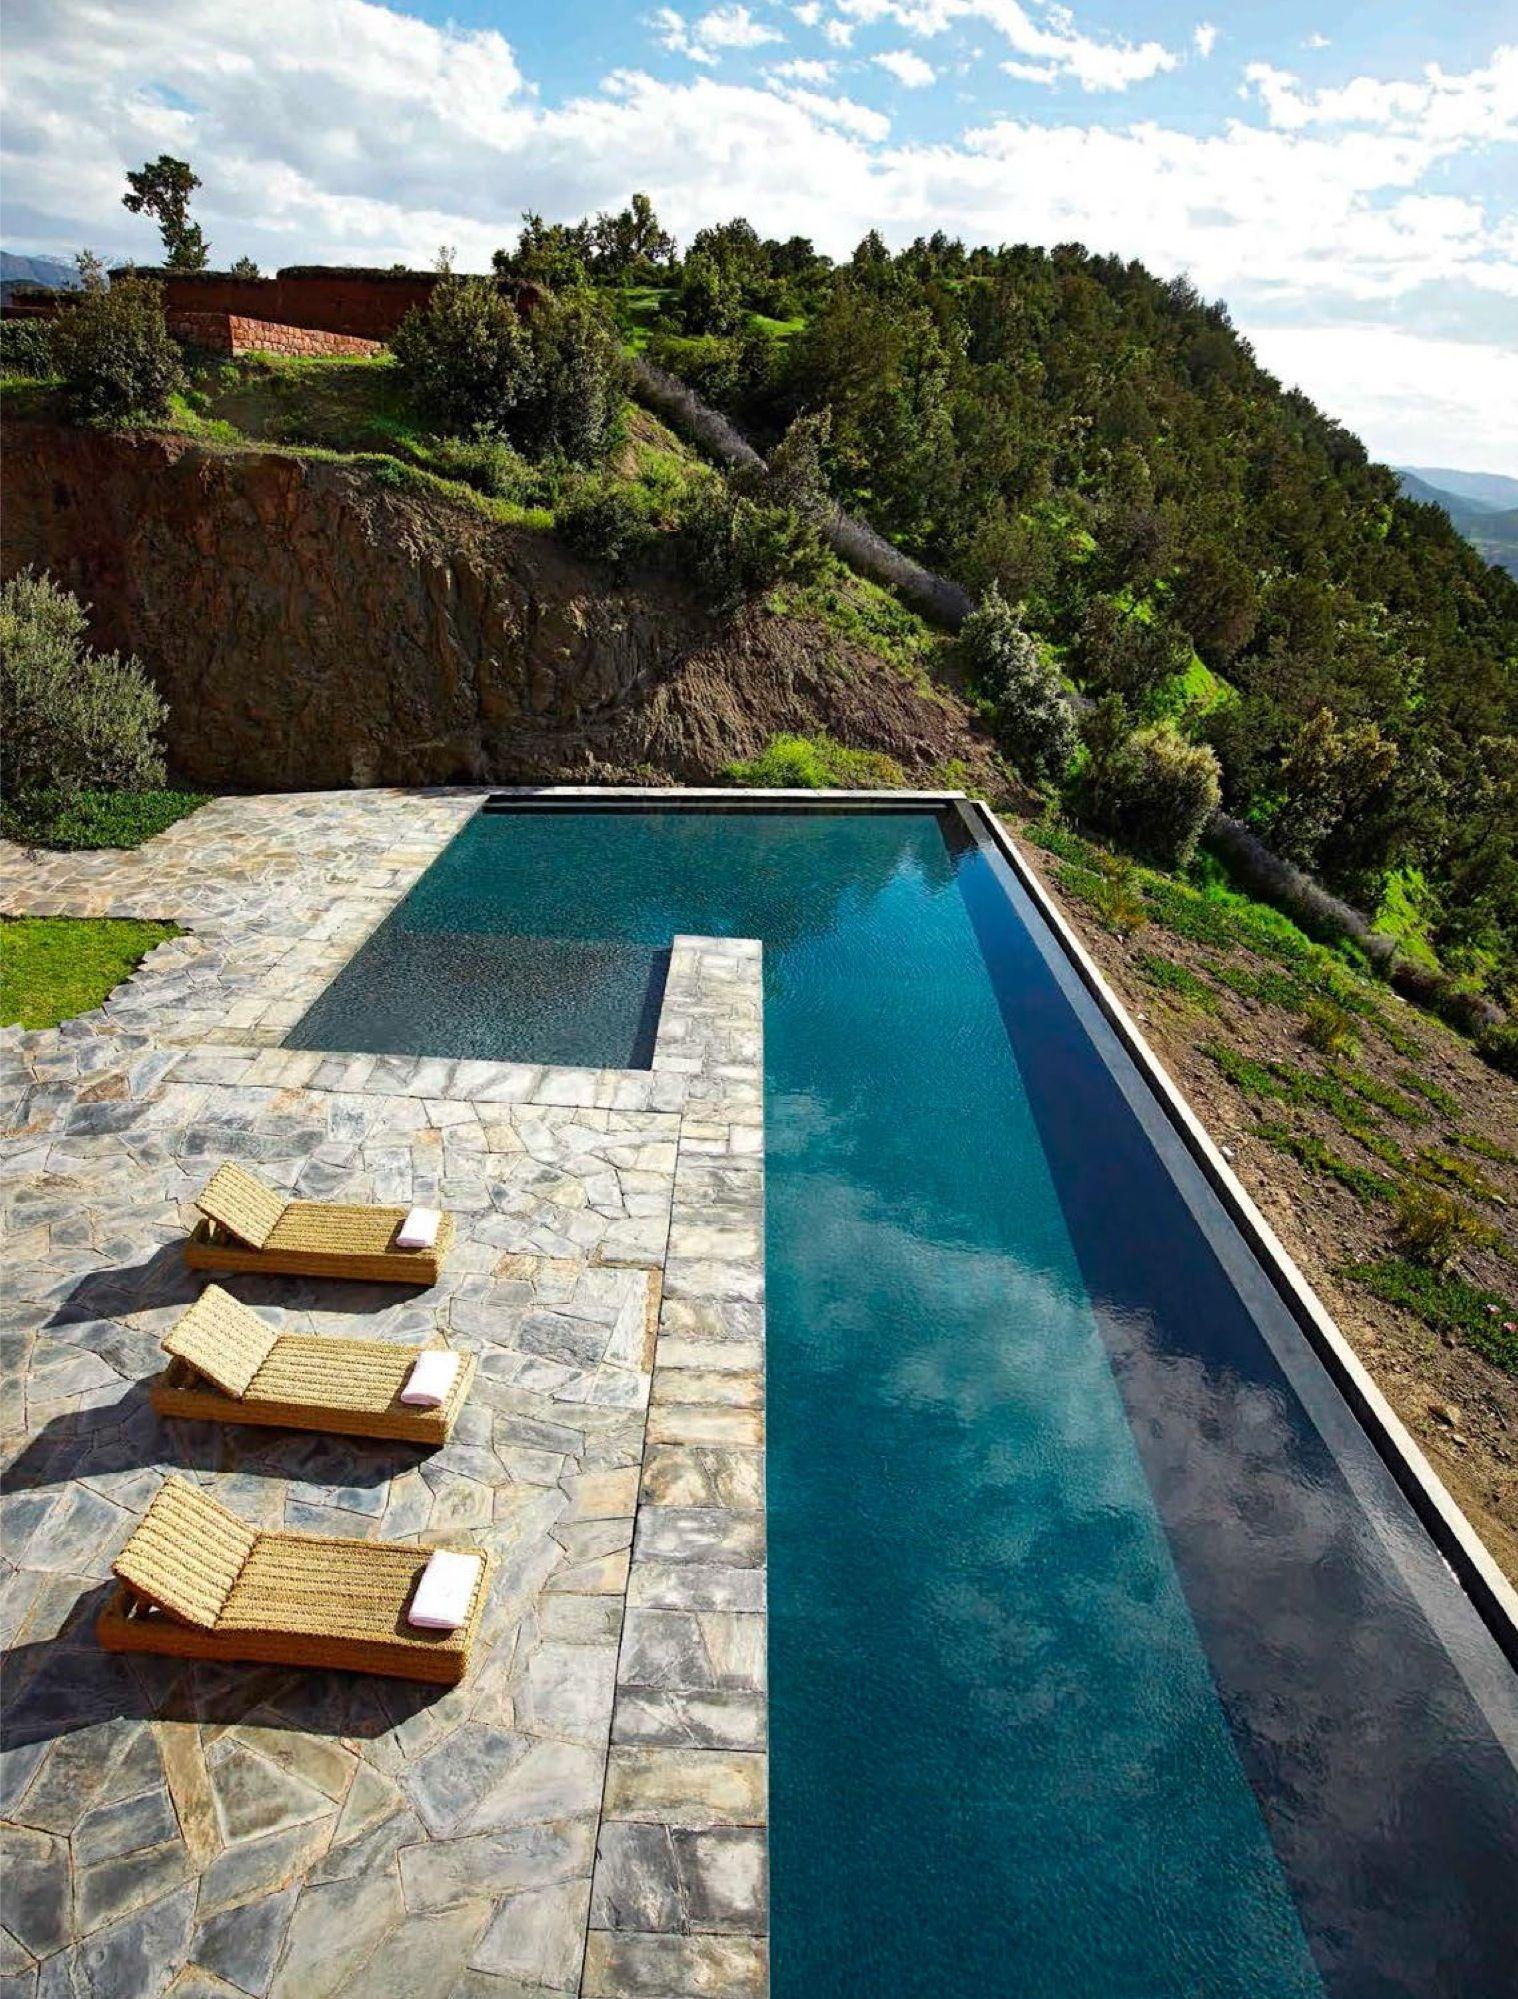 Piscina en el atlas piscinas en 2019 piscinas ideas - Piscinas modernas ...